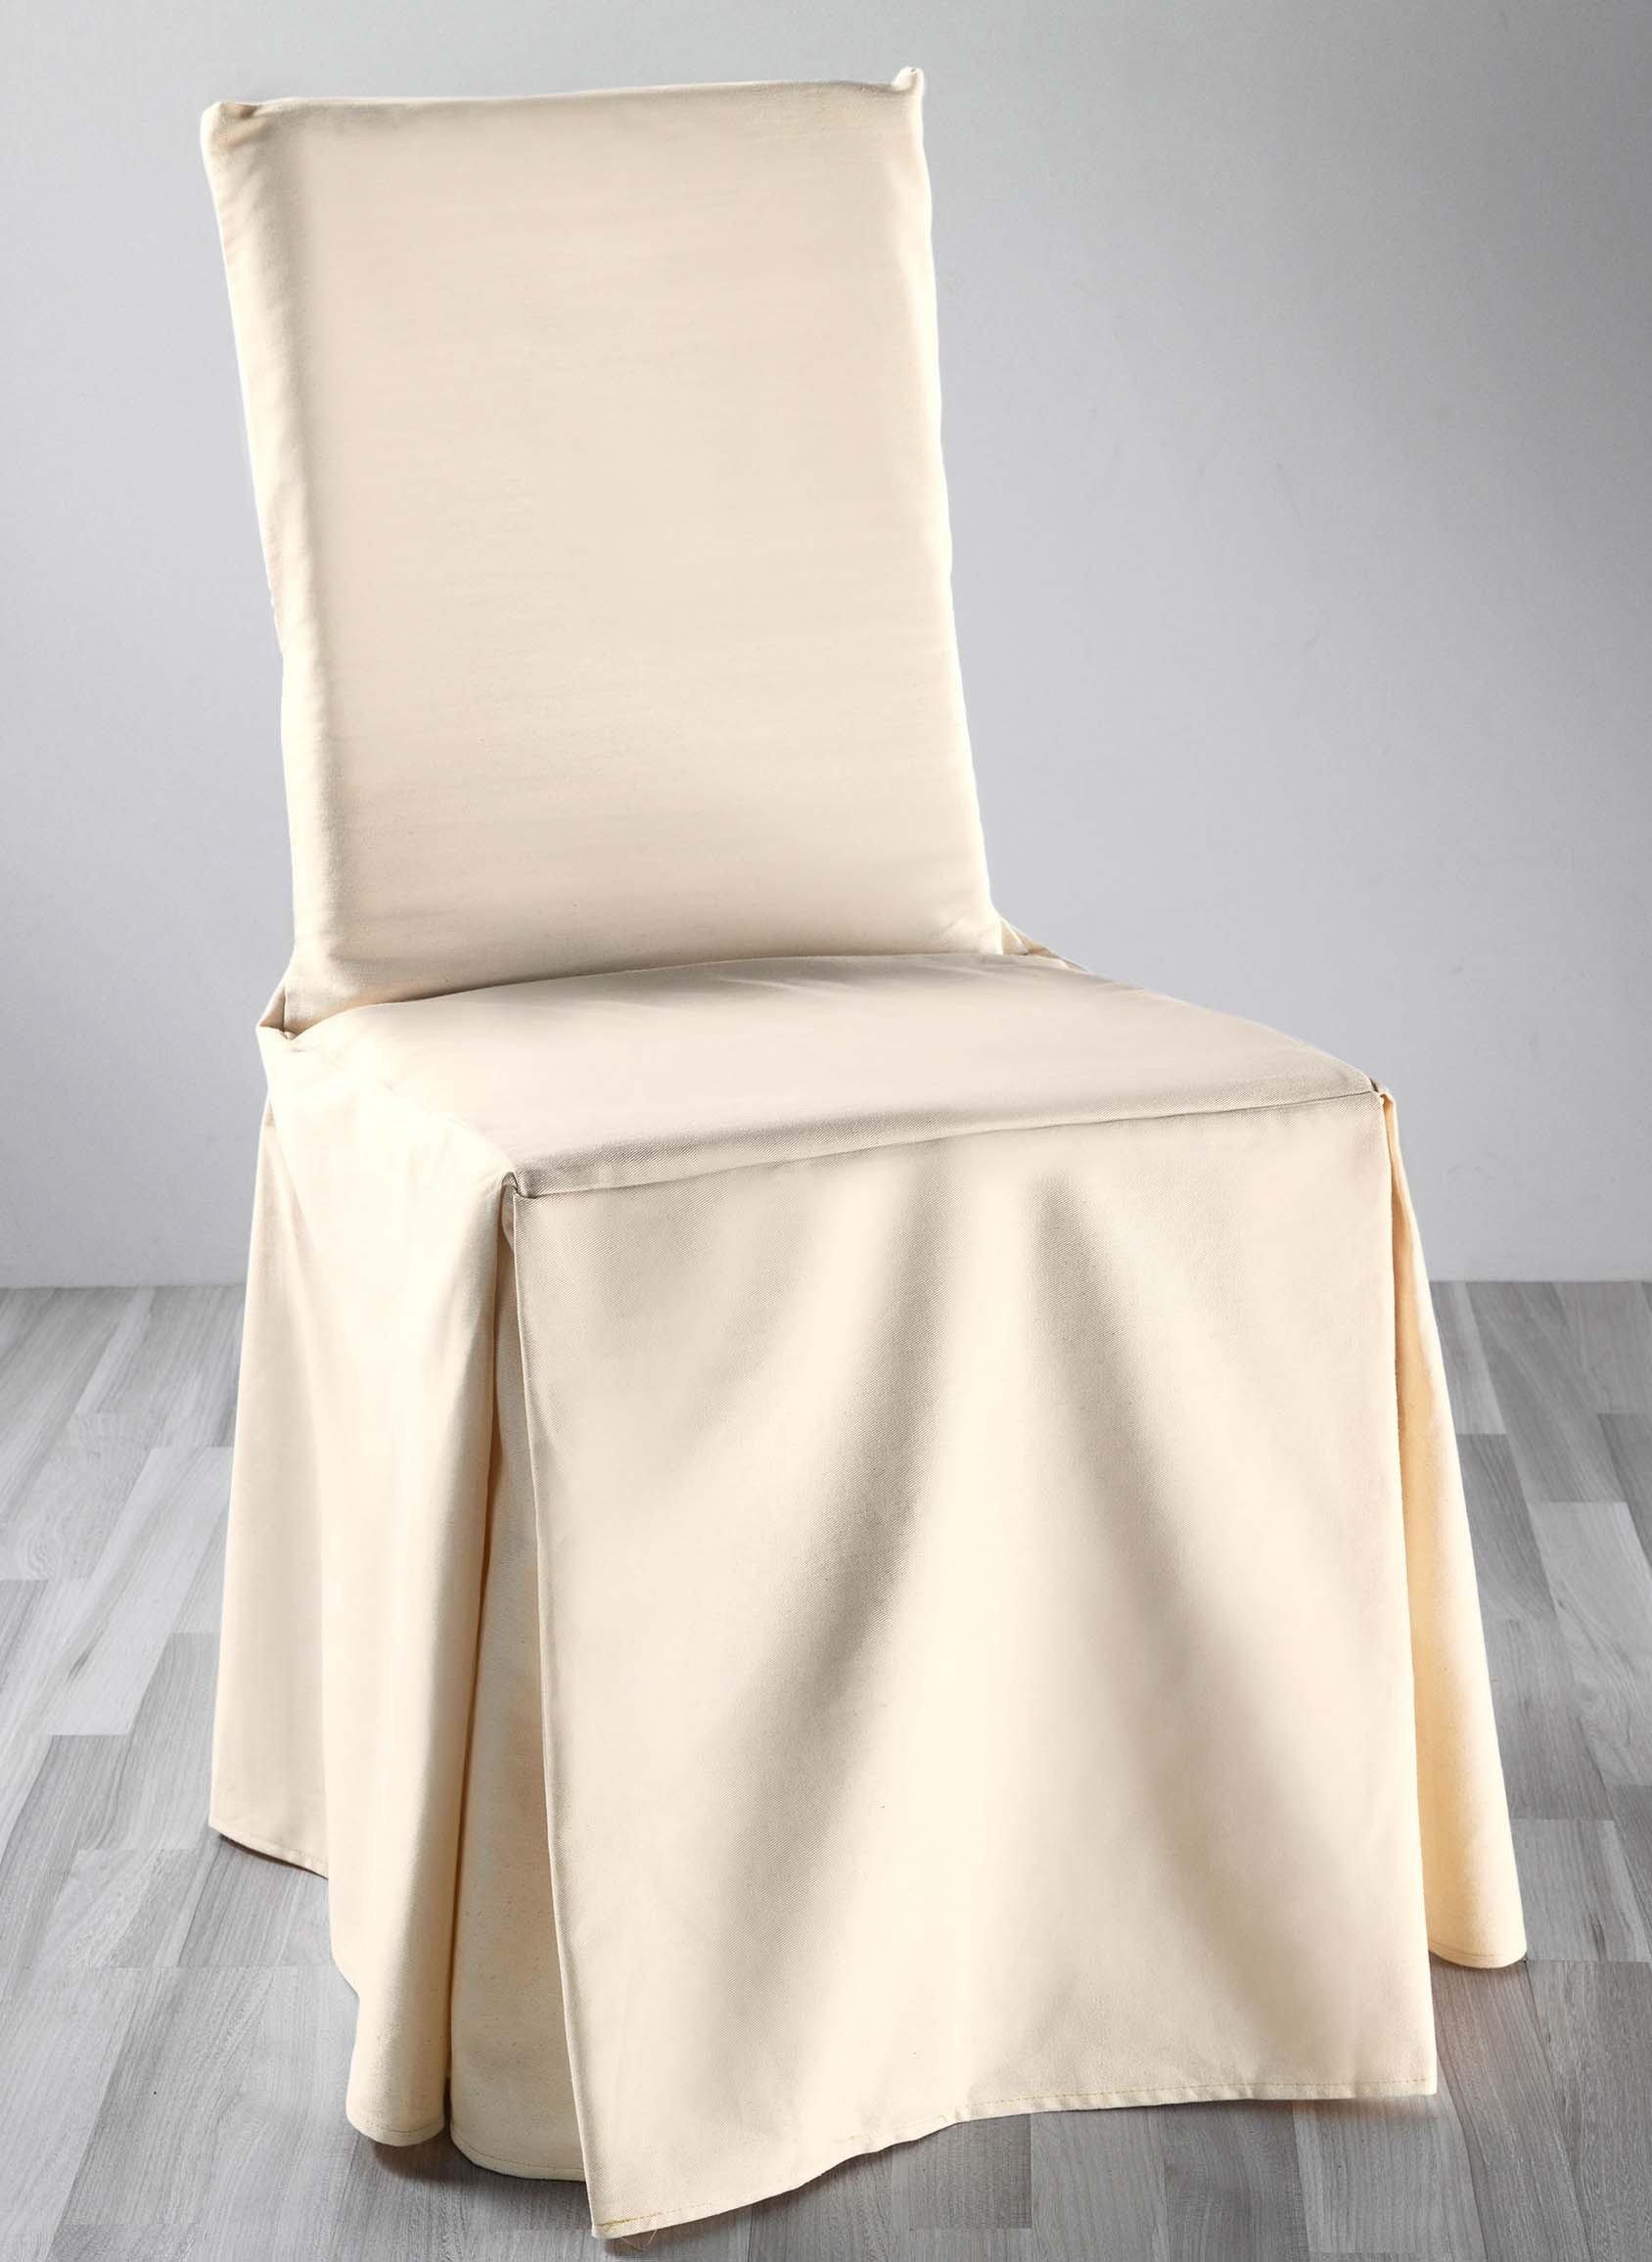 Fodera per sedie